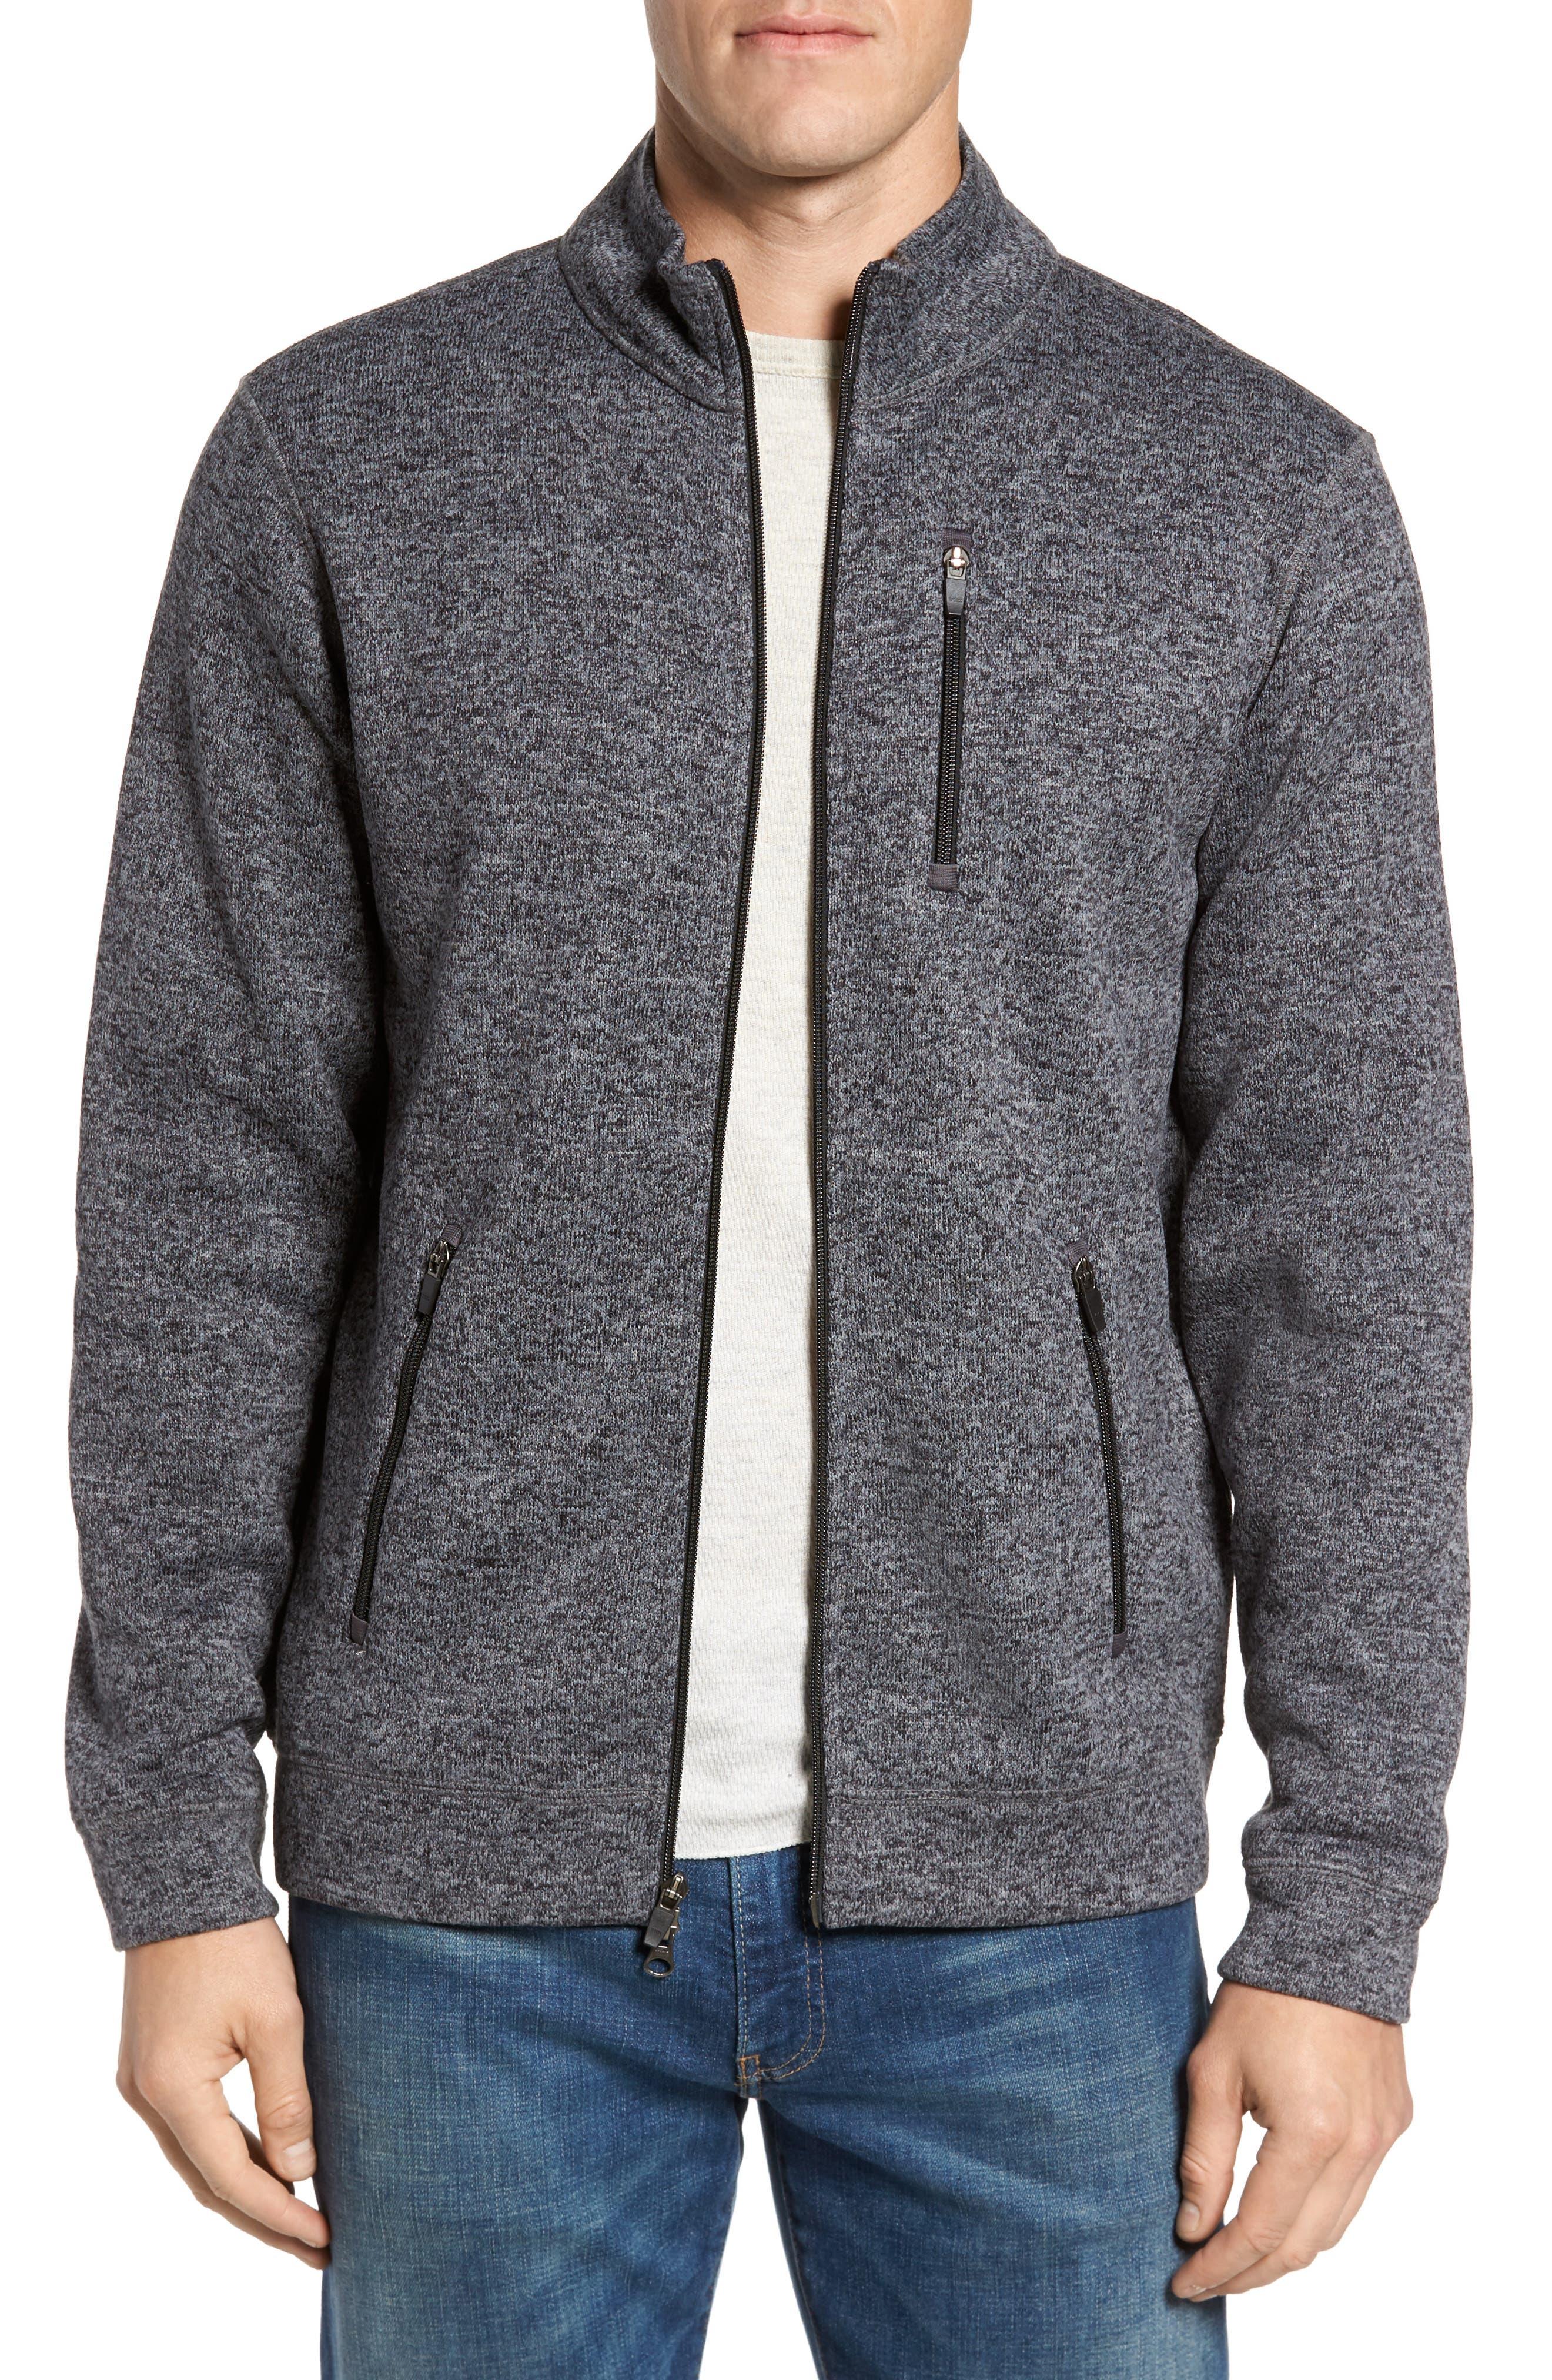 Sweater Knit Fleece Zip Front Jacket,                         Main,                         color,